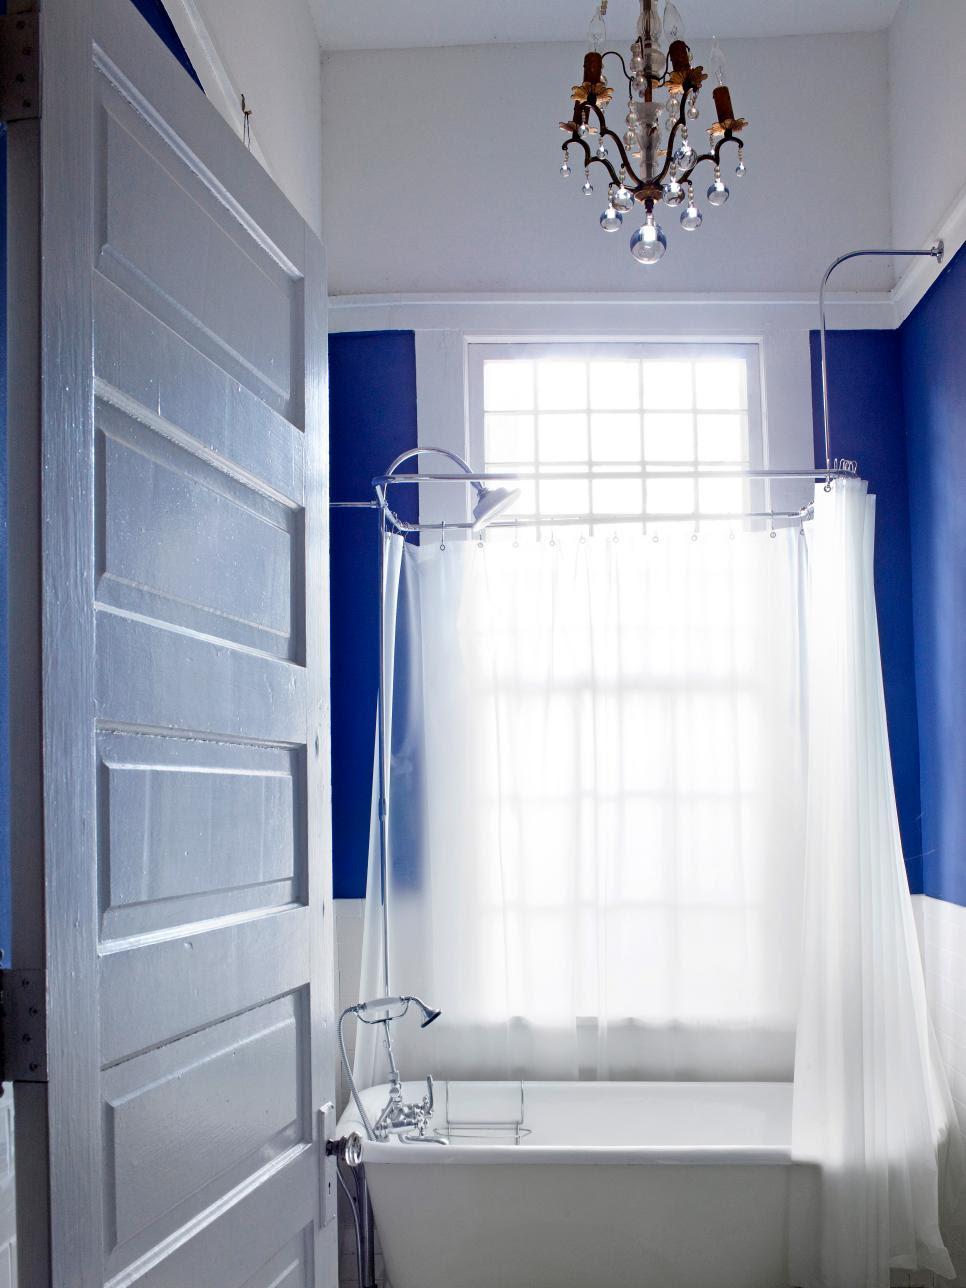 10 Big Ideas for Small Bathrooms | HGTV